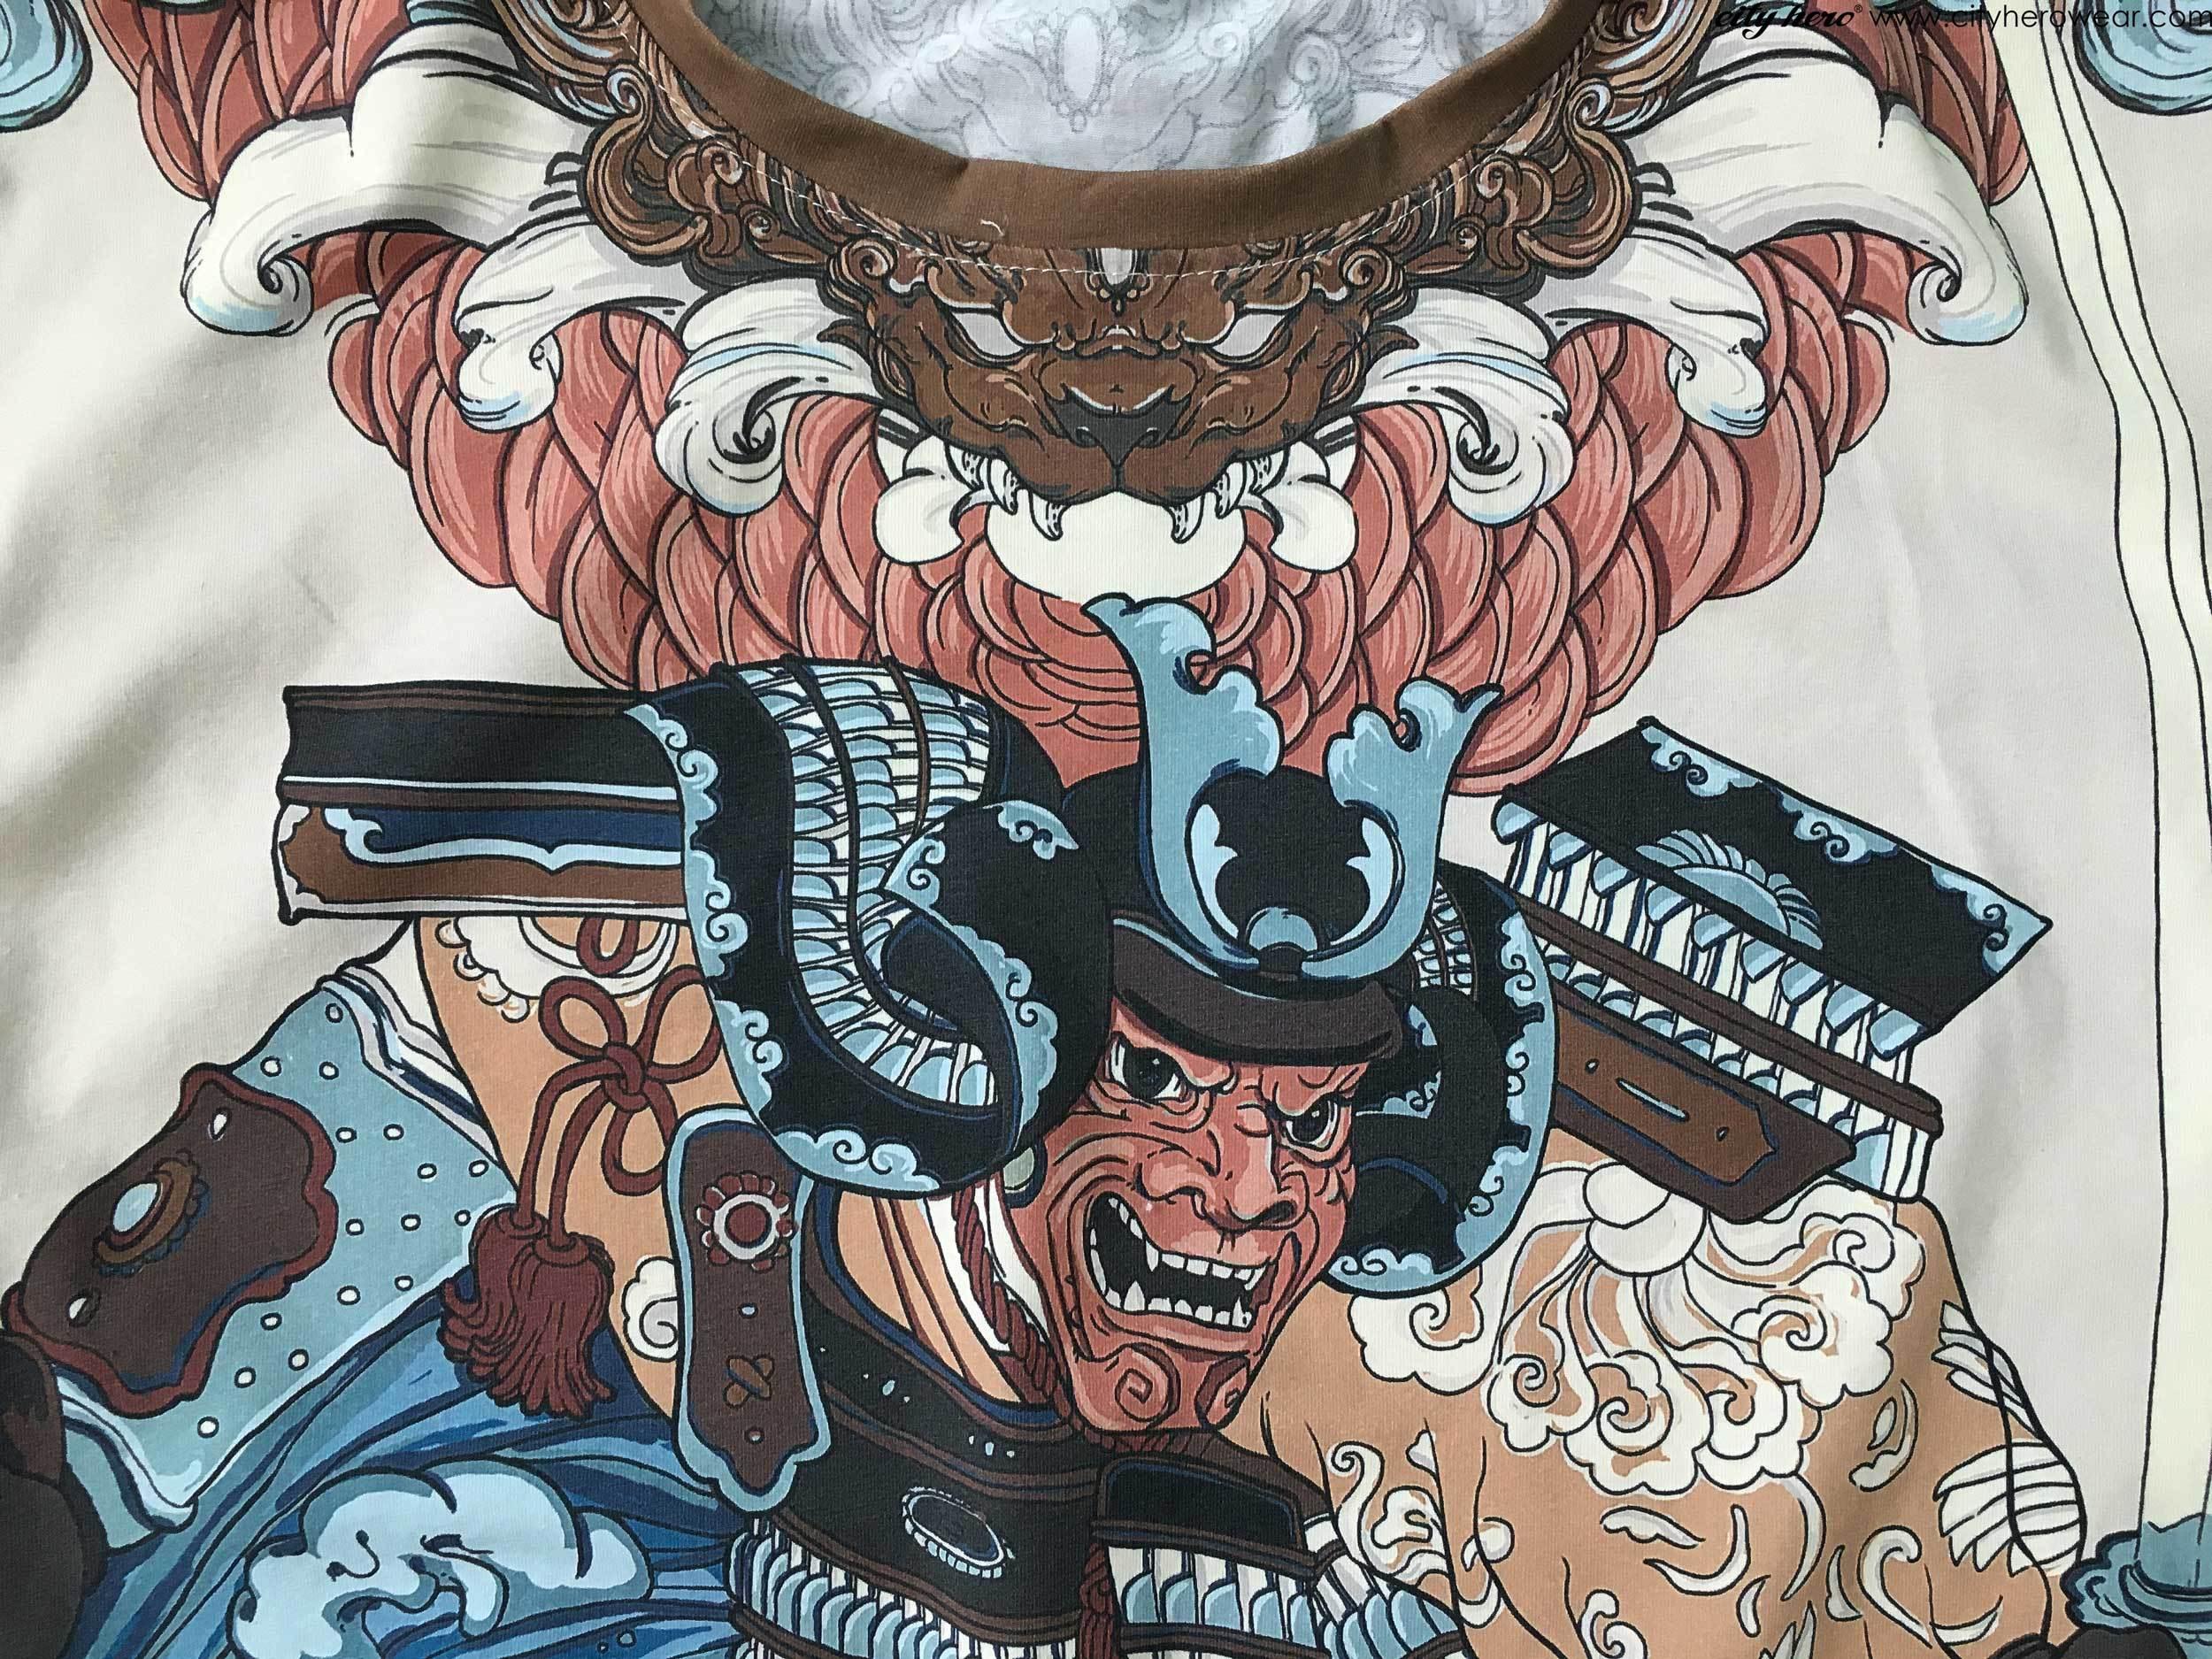 SAMURAI STORY 5.0 [ФУТБОЛКА МУЖСКАЯ]